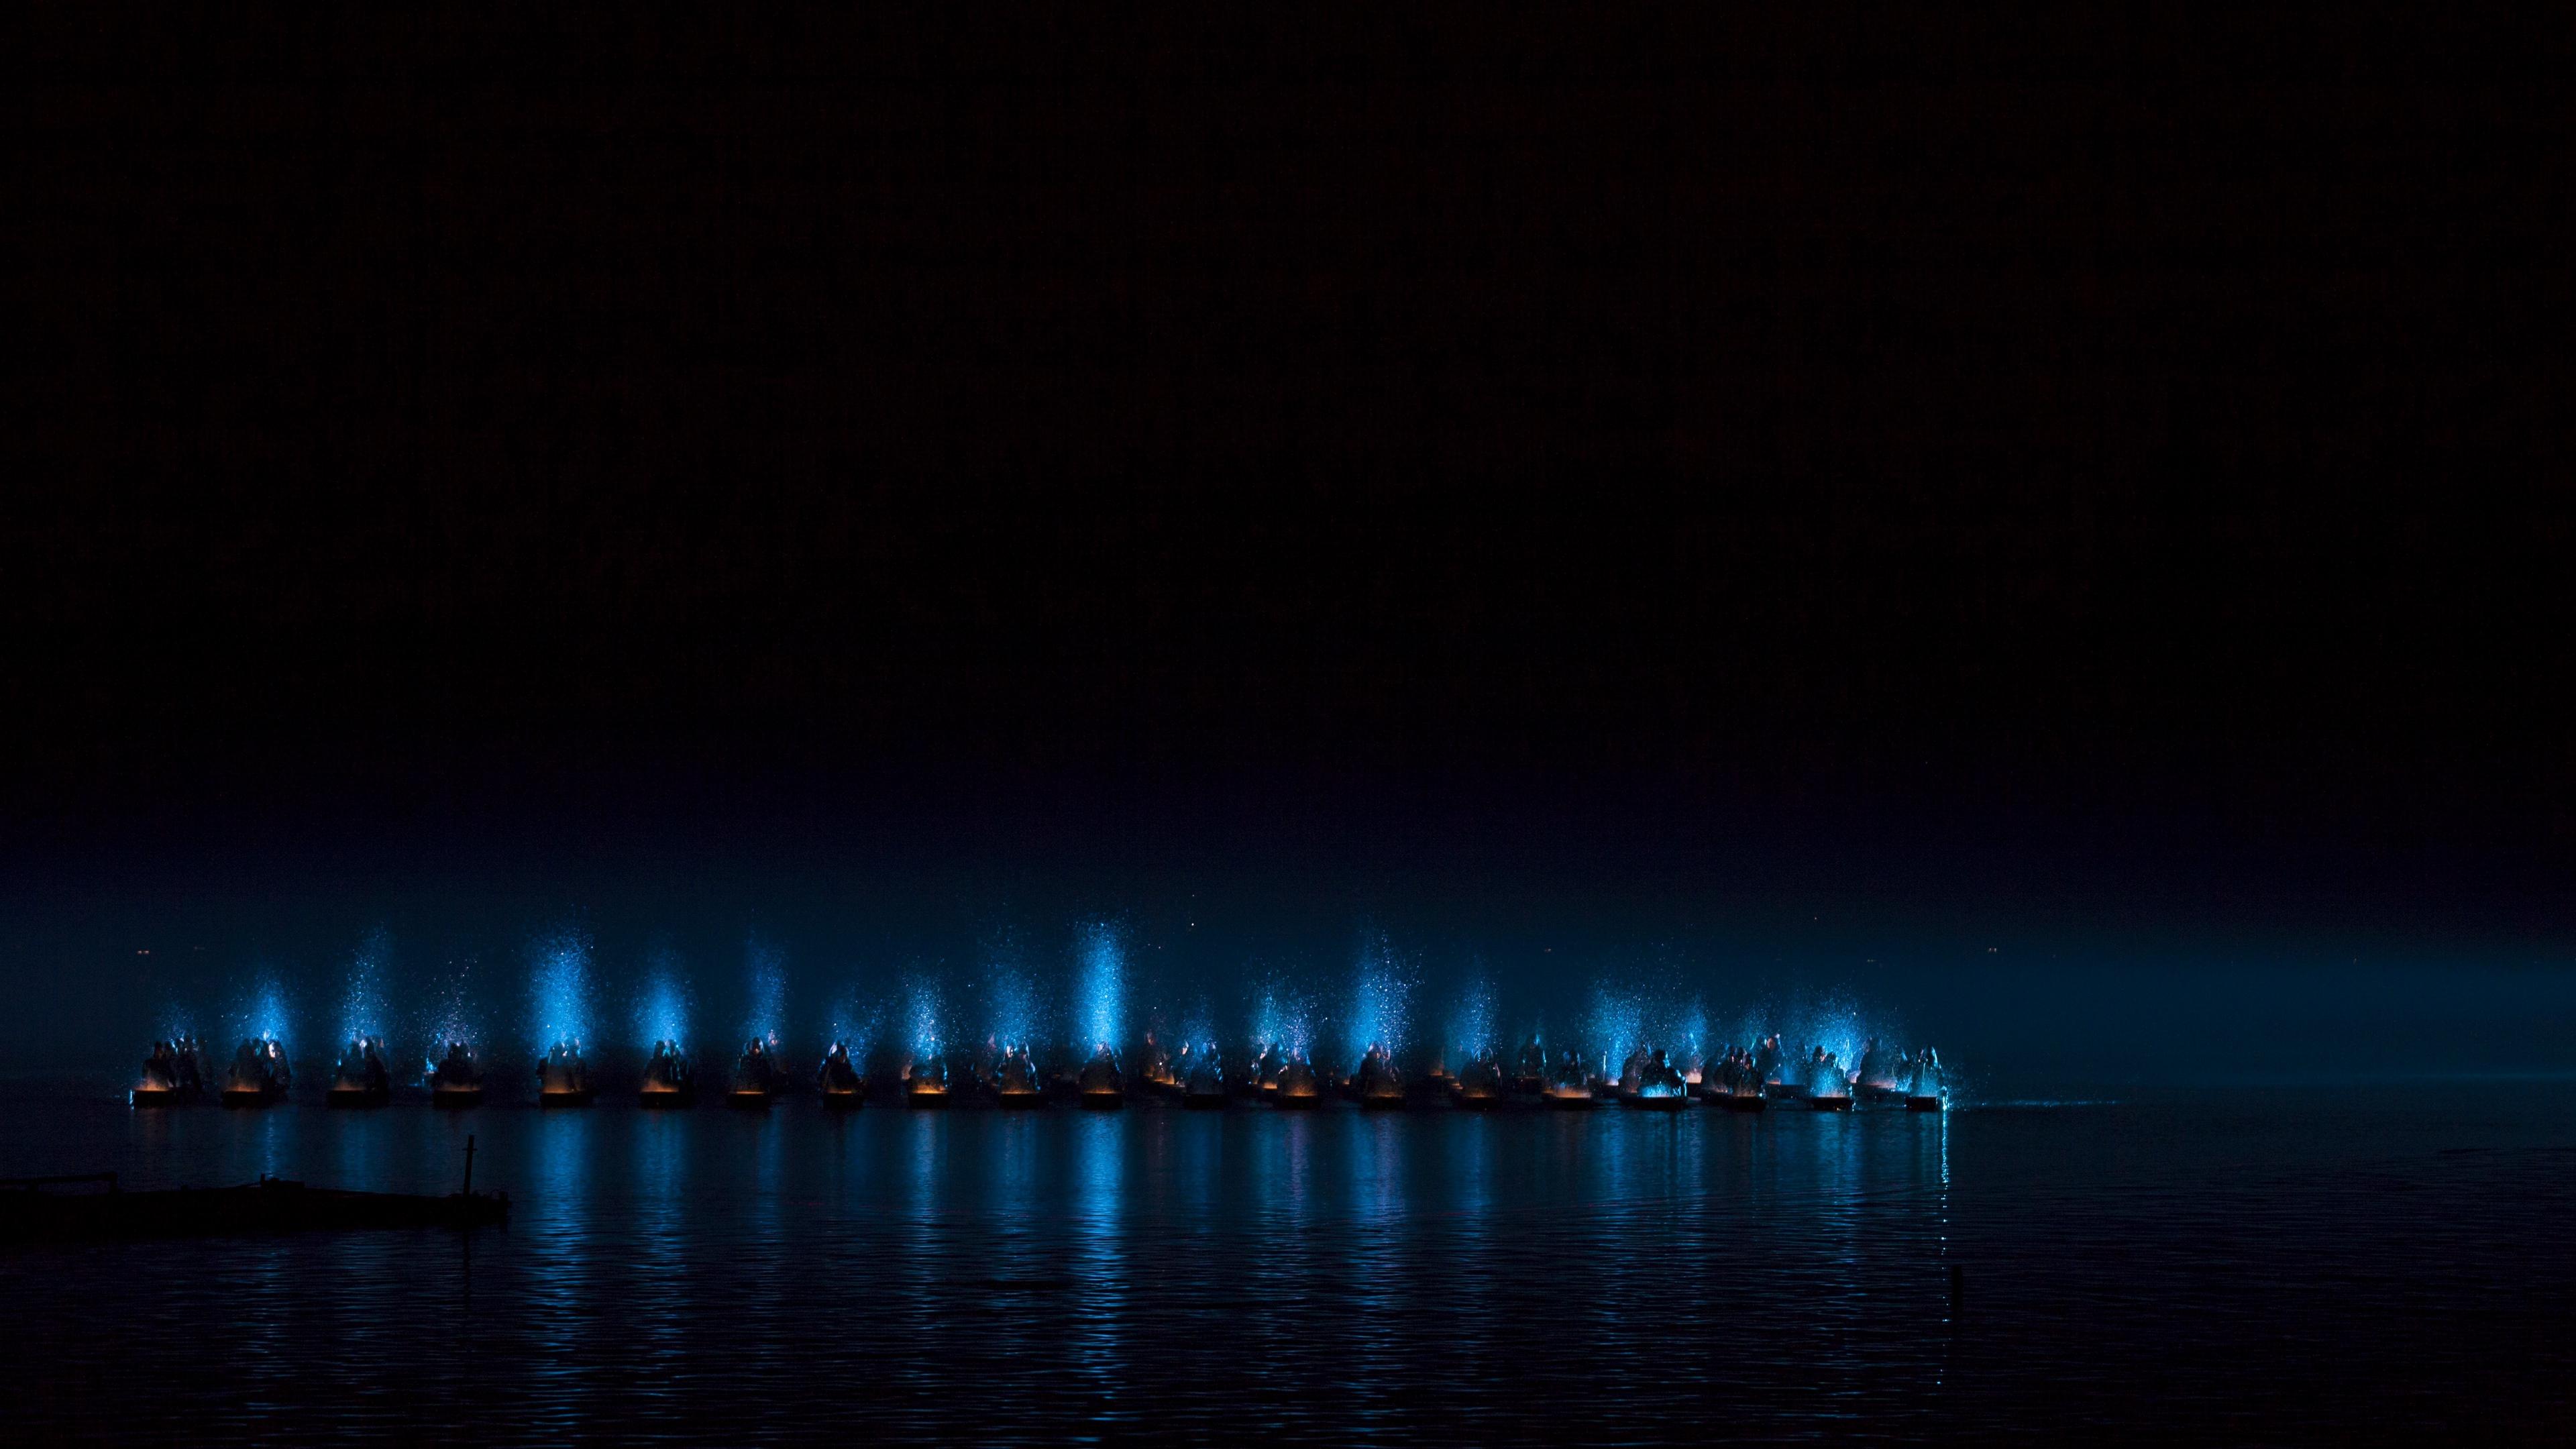 boats people sea night 4k 1540575077 - boats, people, sea, night 4k - Sea, People, boats